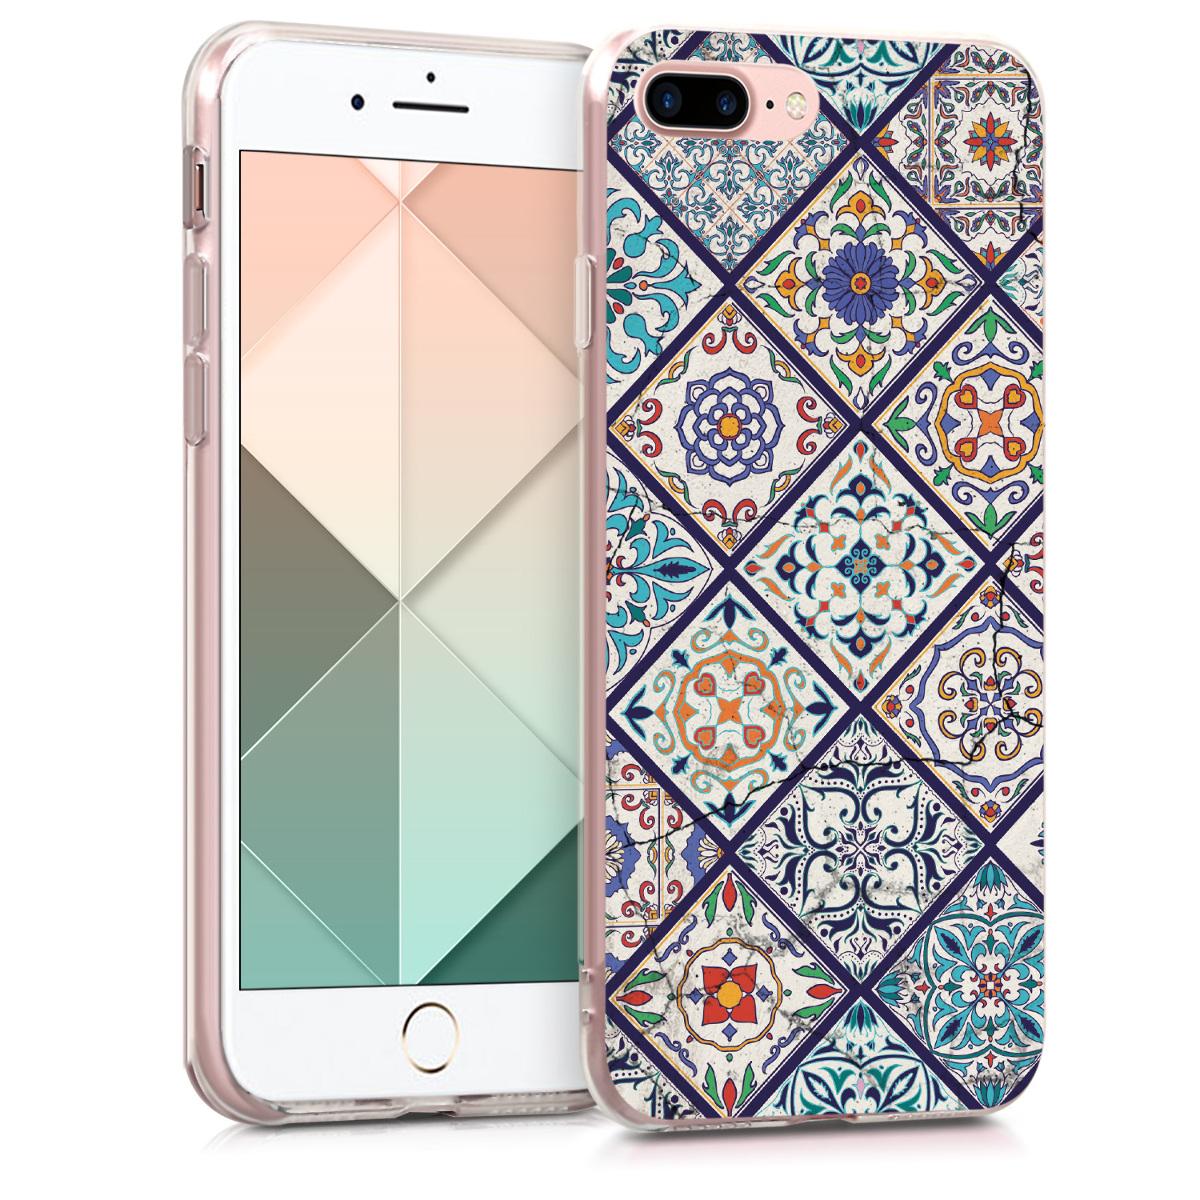 KW Θήκη Σιλικόνης Apple iPhone 7 Plus / 8 Plus - Blue / Orange / White (39500.27)